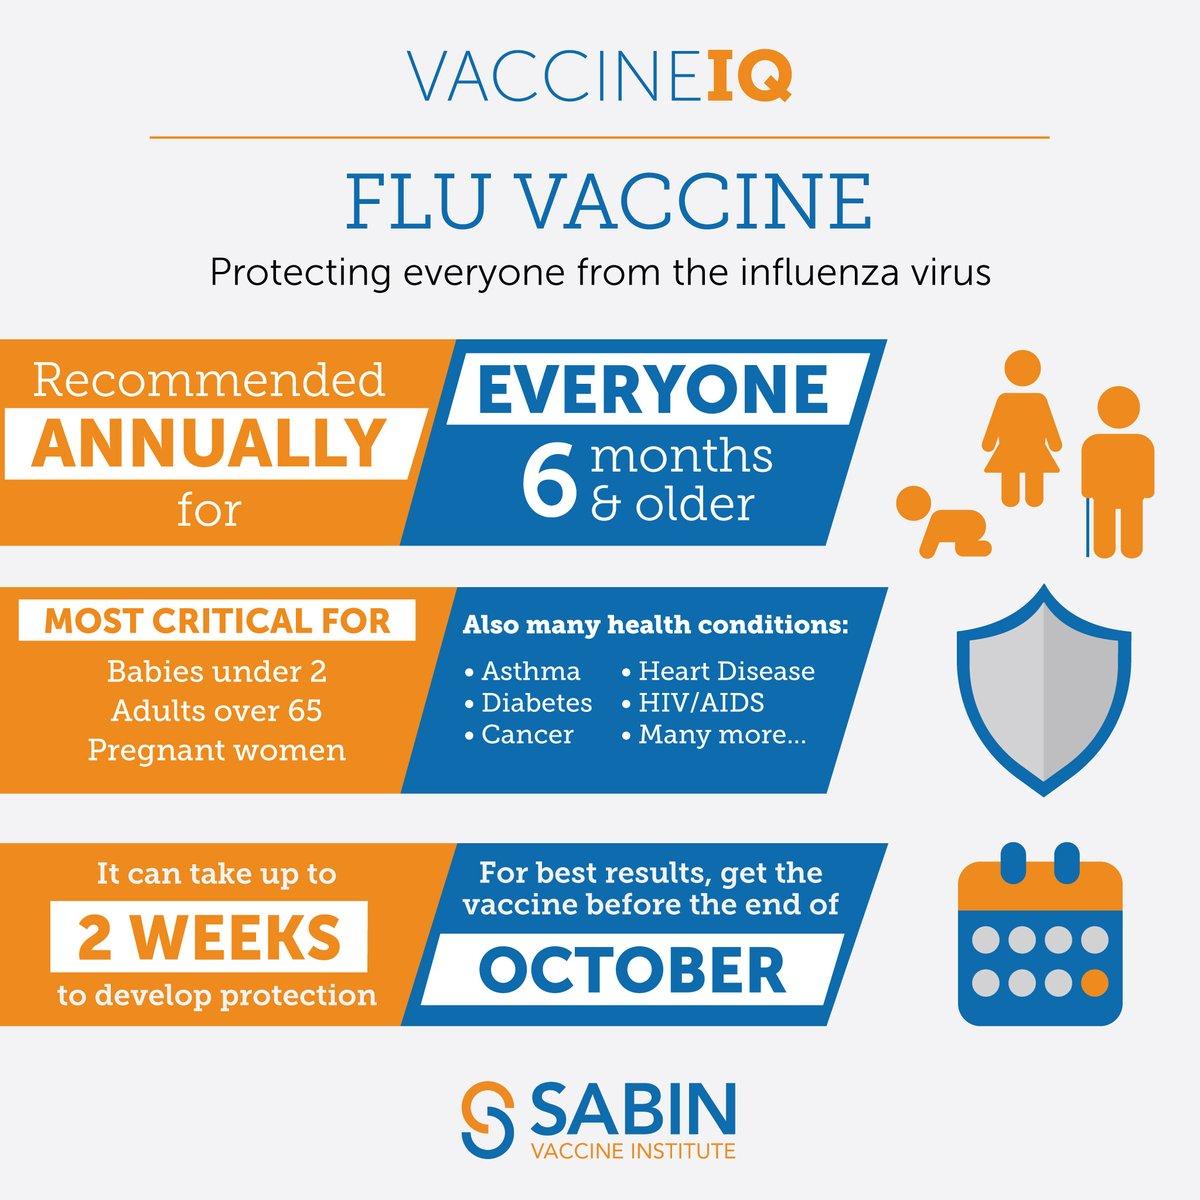 sabinvaccine photo